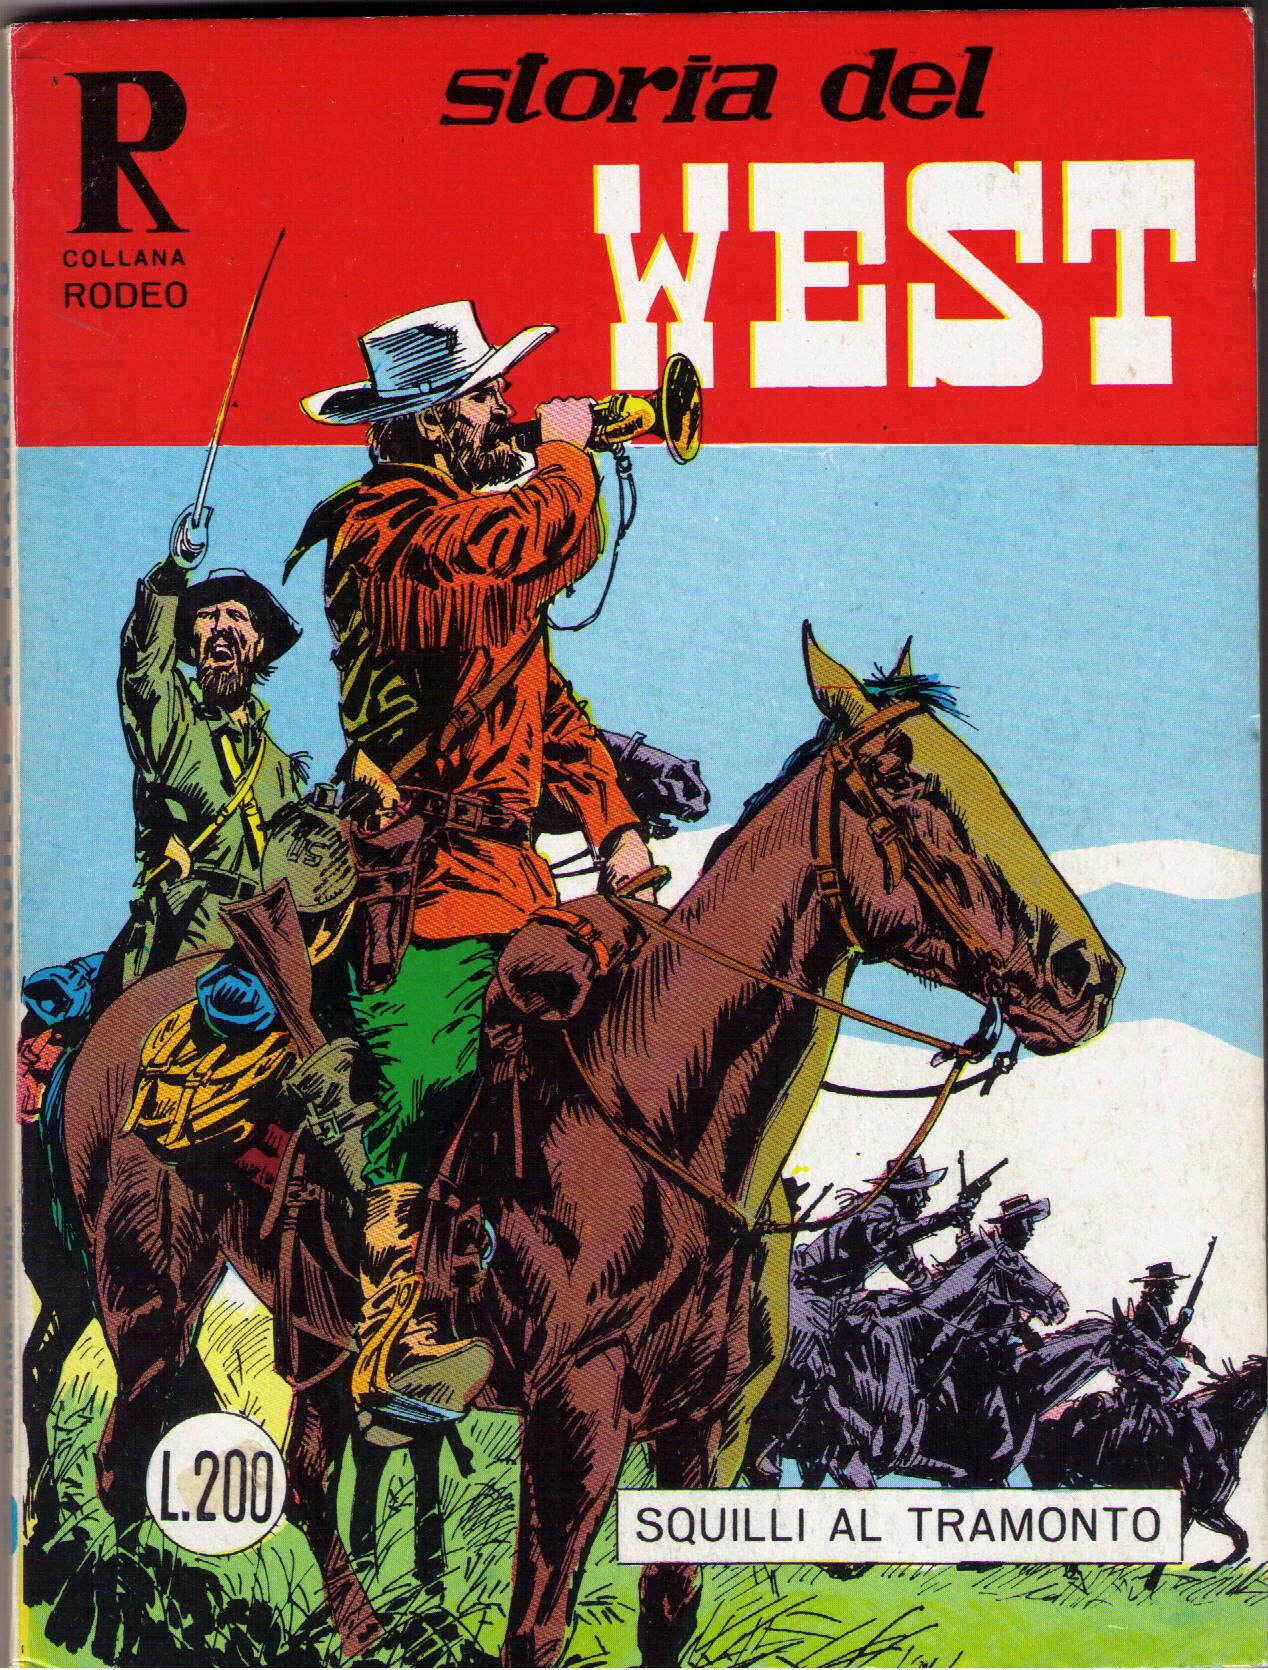 Storia del West n.23 (Collana Rodeo n.50)